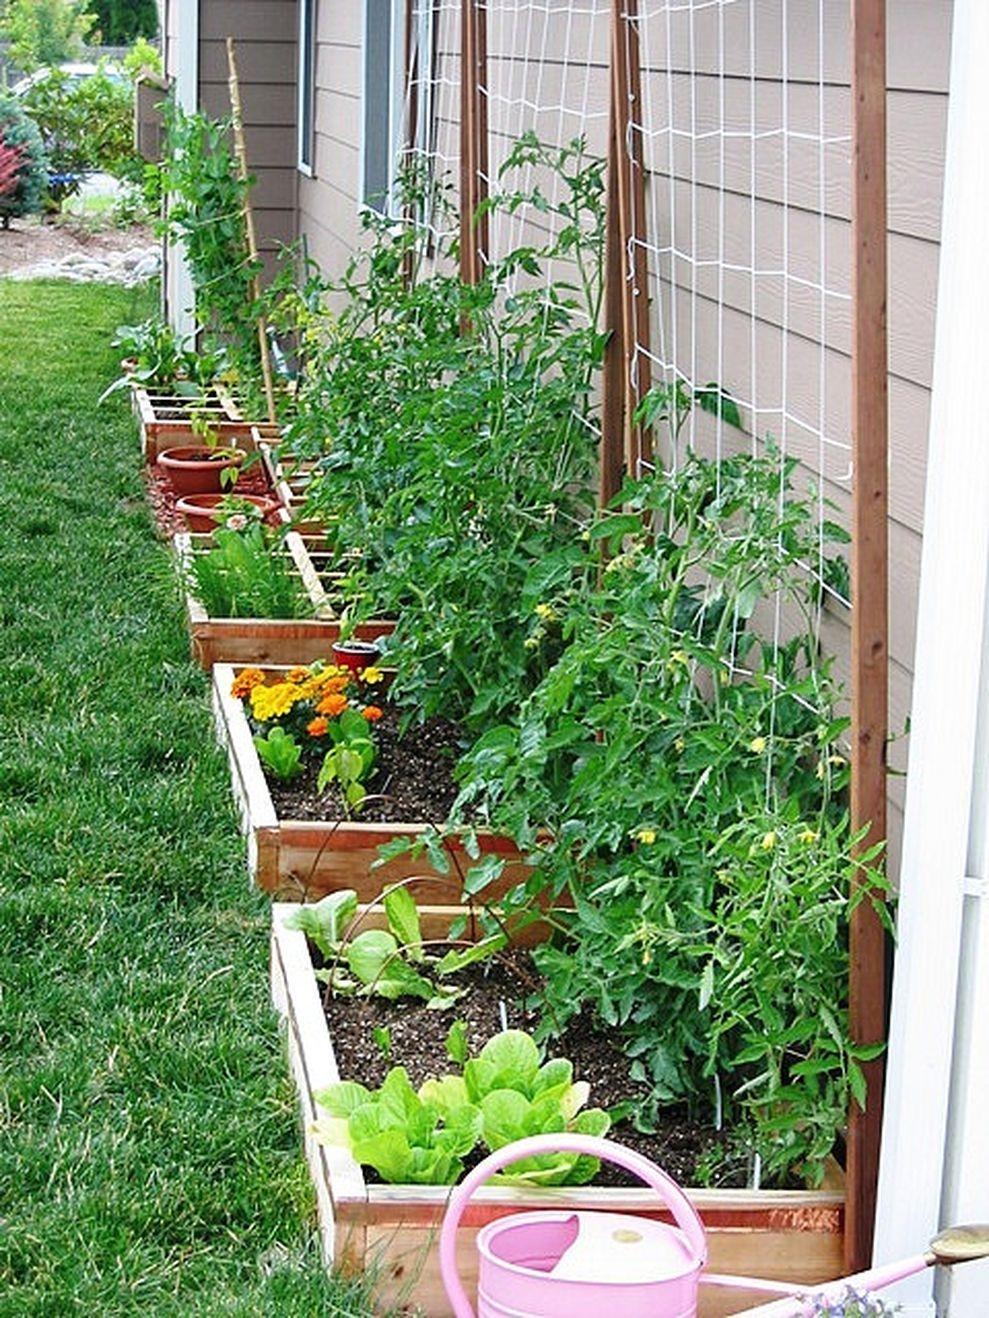 Rustic Vegetable Garden Design Ideas For Your Backyard Inspiration 48